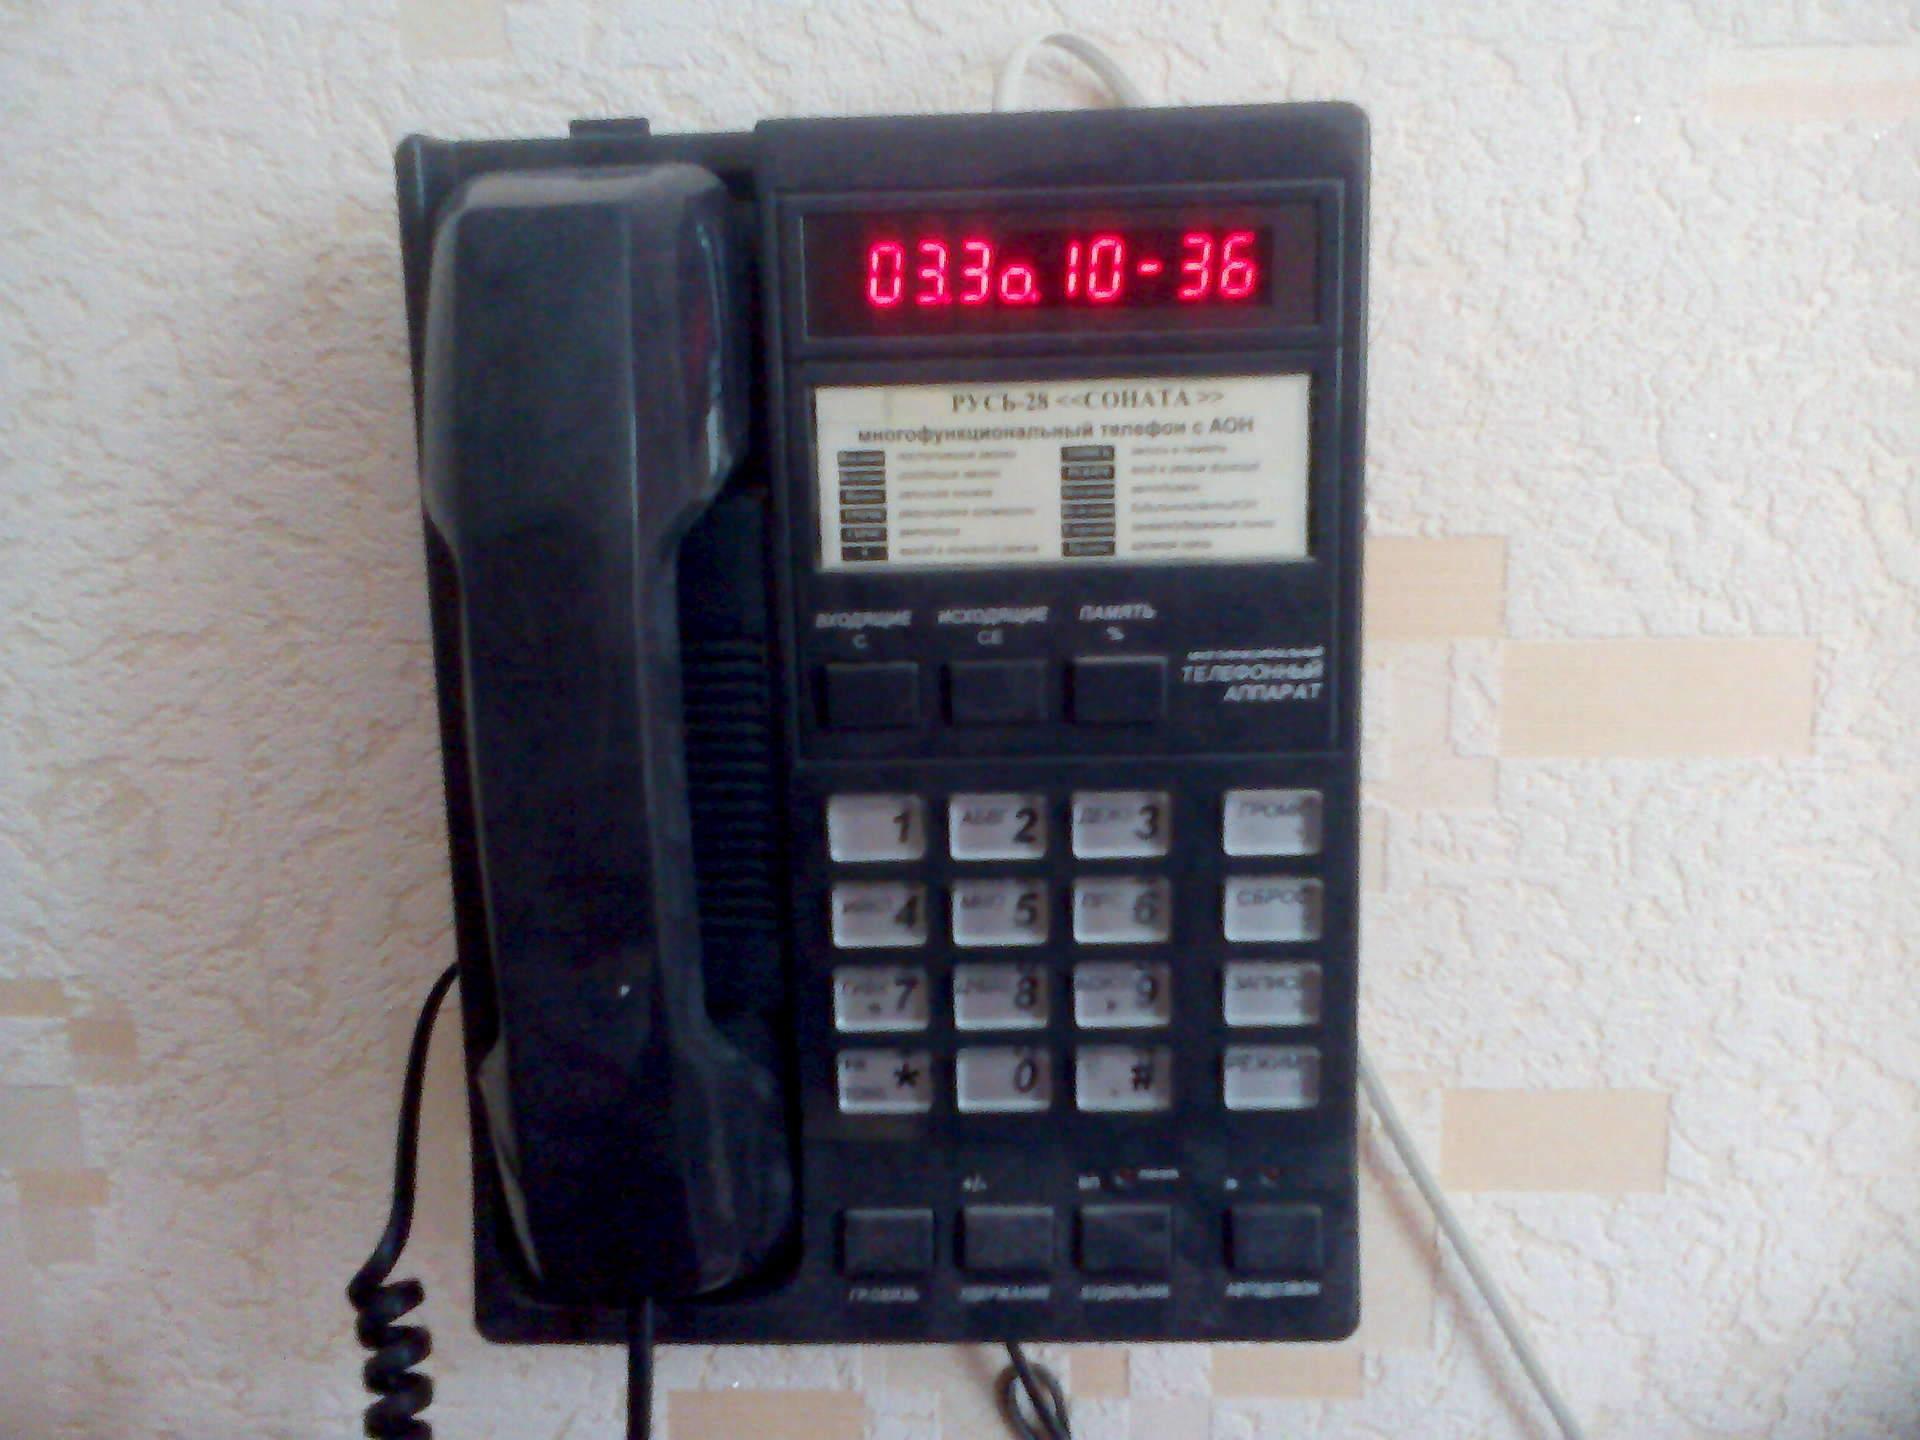 dceccbb104262 1920 X 1440 178.5 Kb Продам телефон с аон, Русь-28,